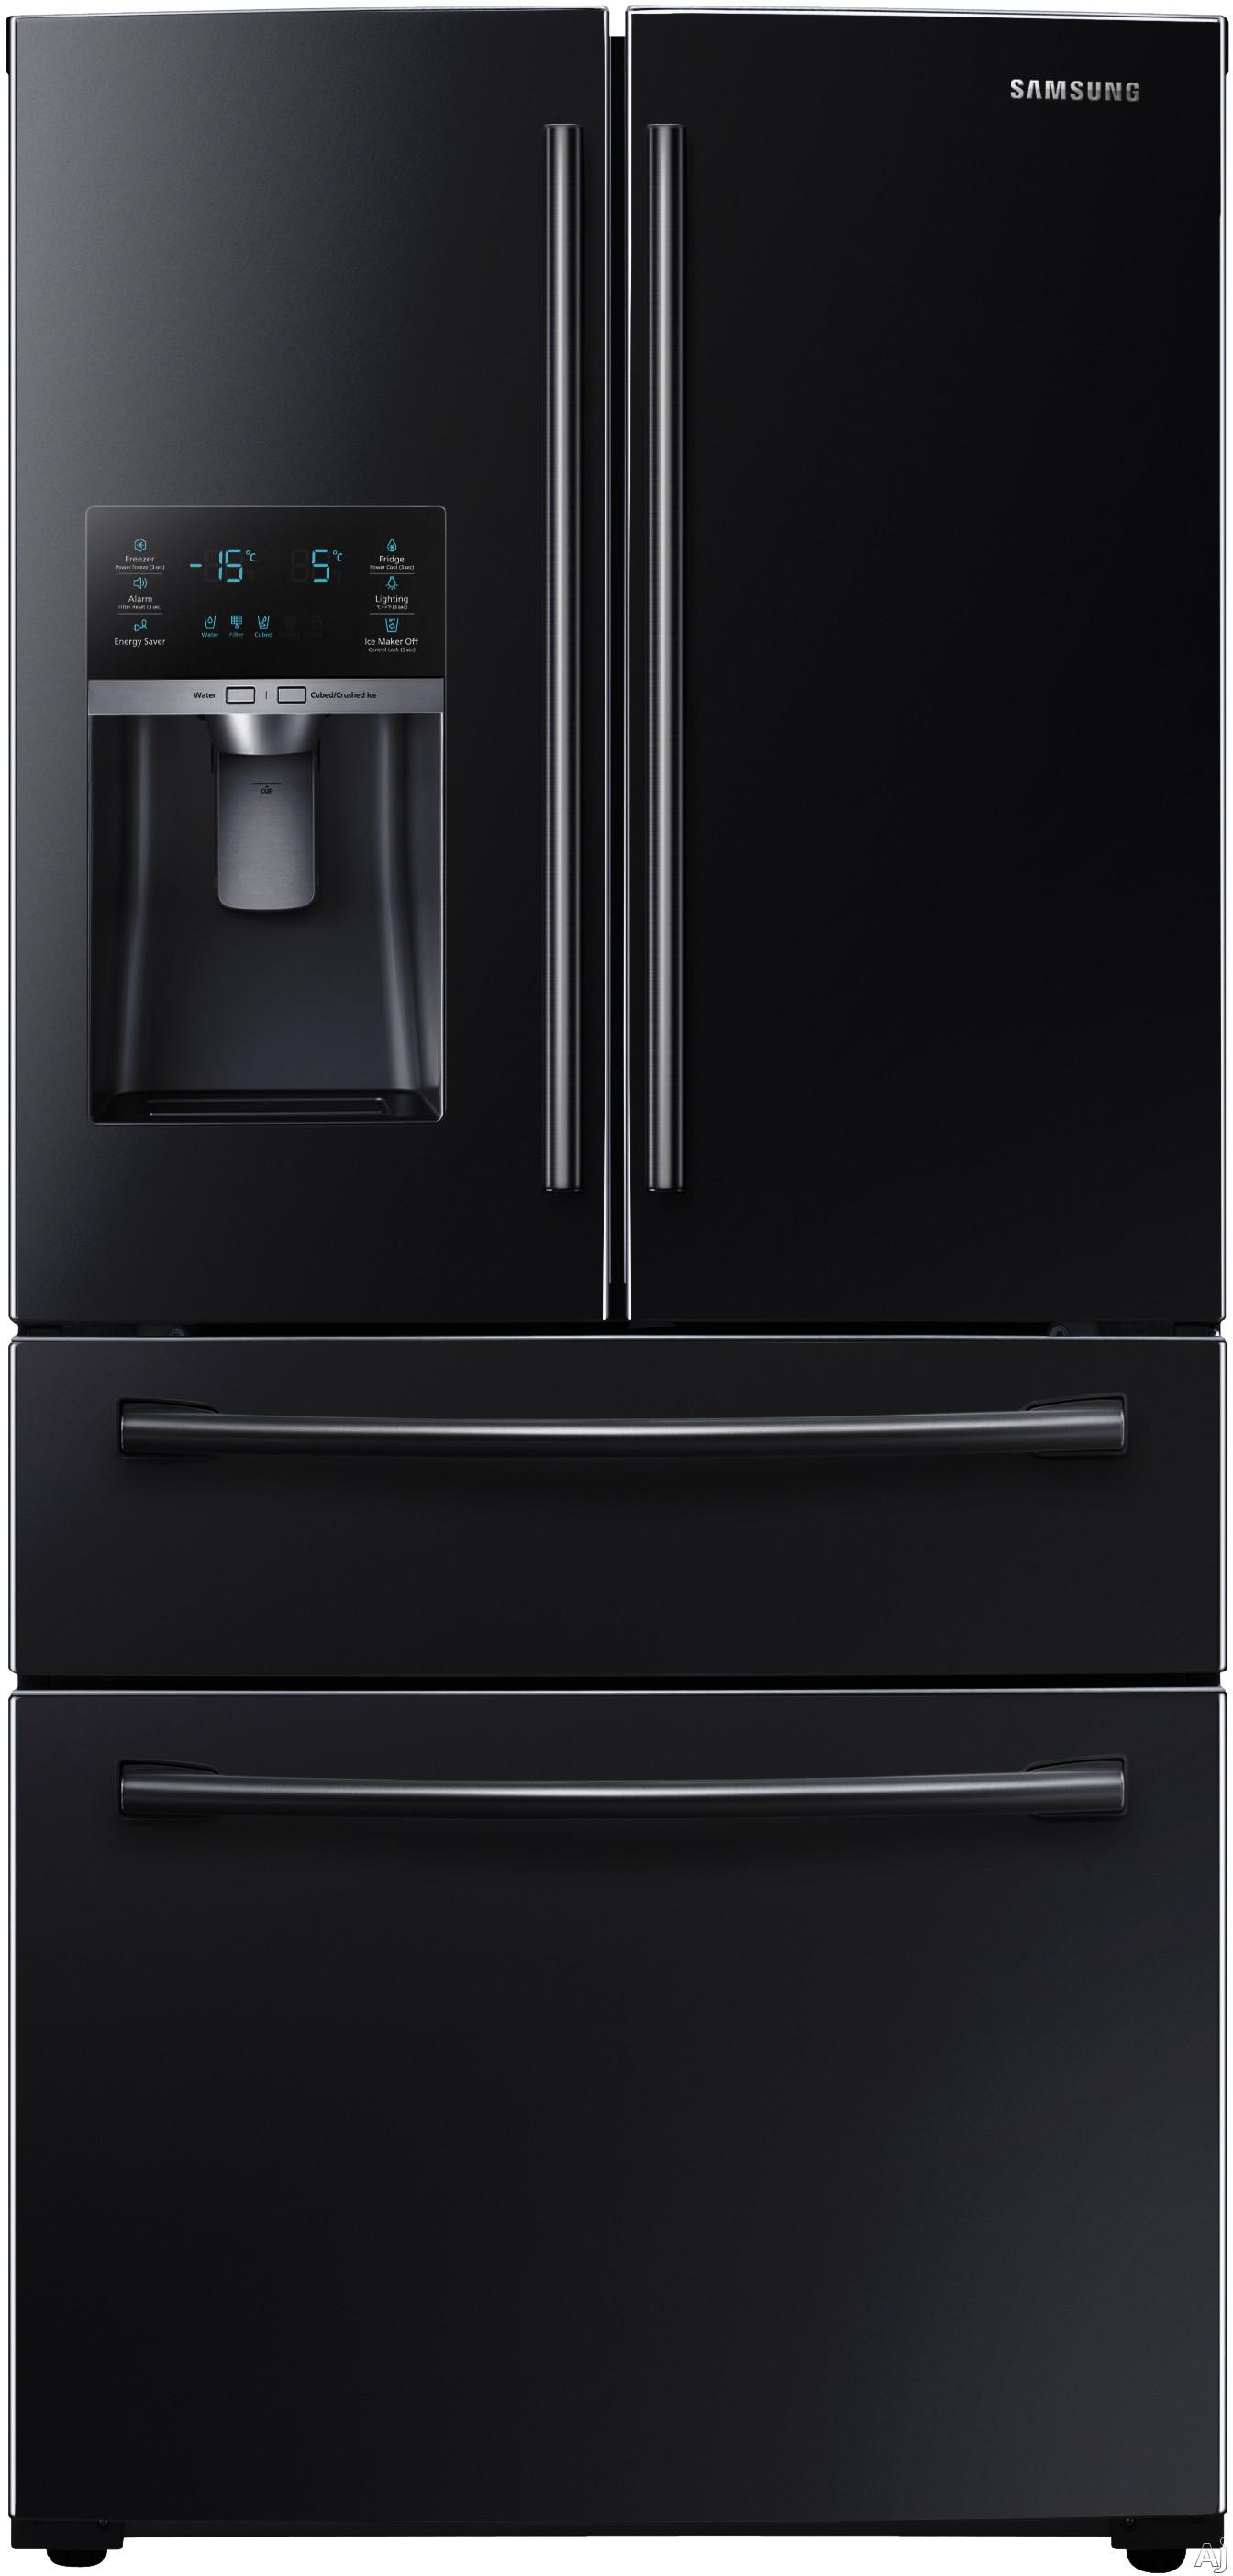 Samsung Rf28hmedb 36 Inch French Door Refrigerator With 28